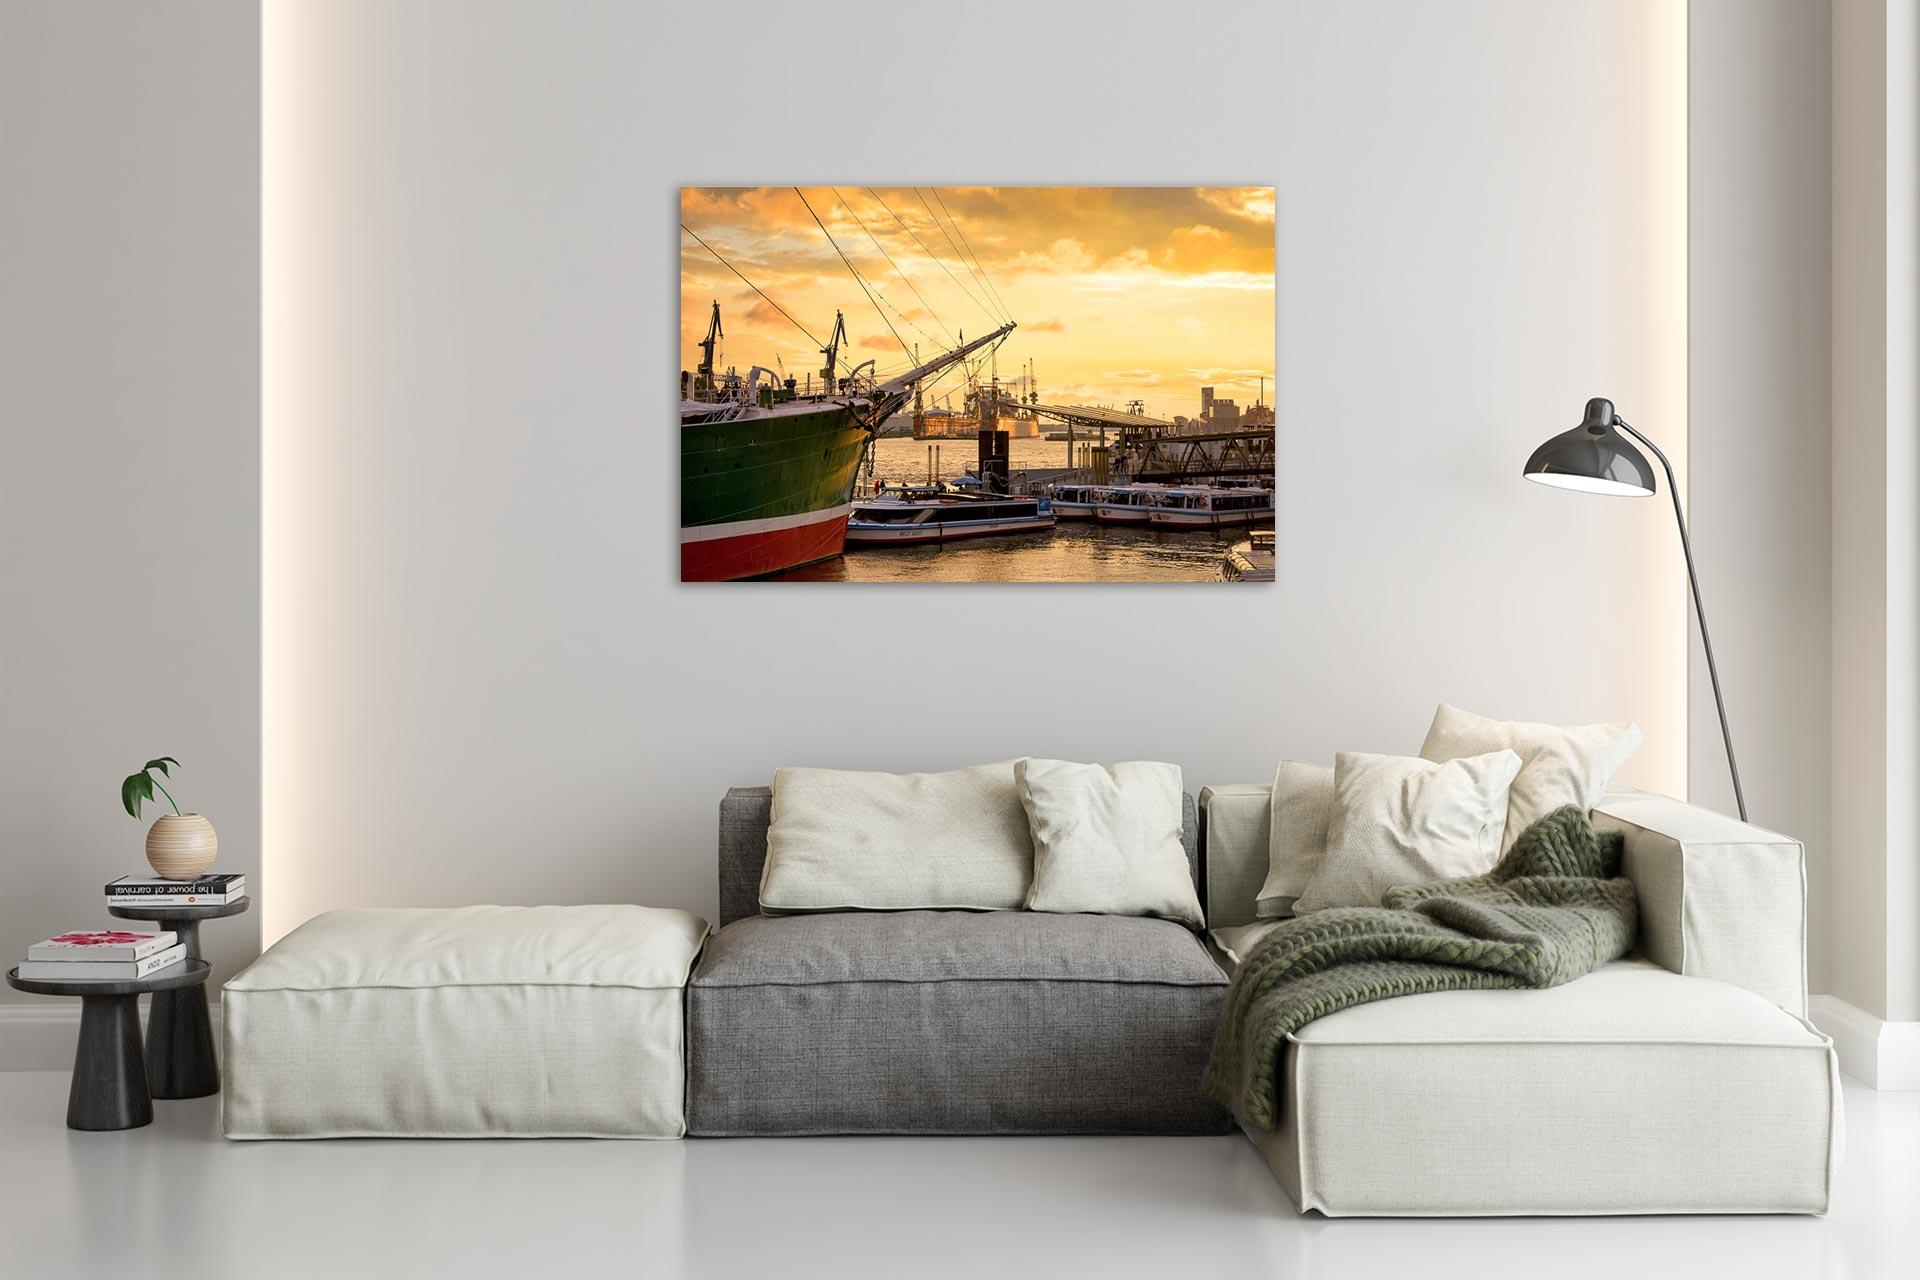 TG611-tickmer-rickmers-wandbild-bild-auf-leinwand-acrylglas-aludibond-wohnzimmer